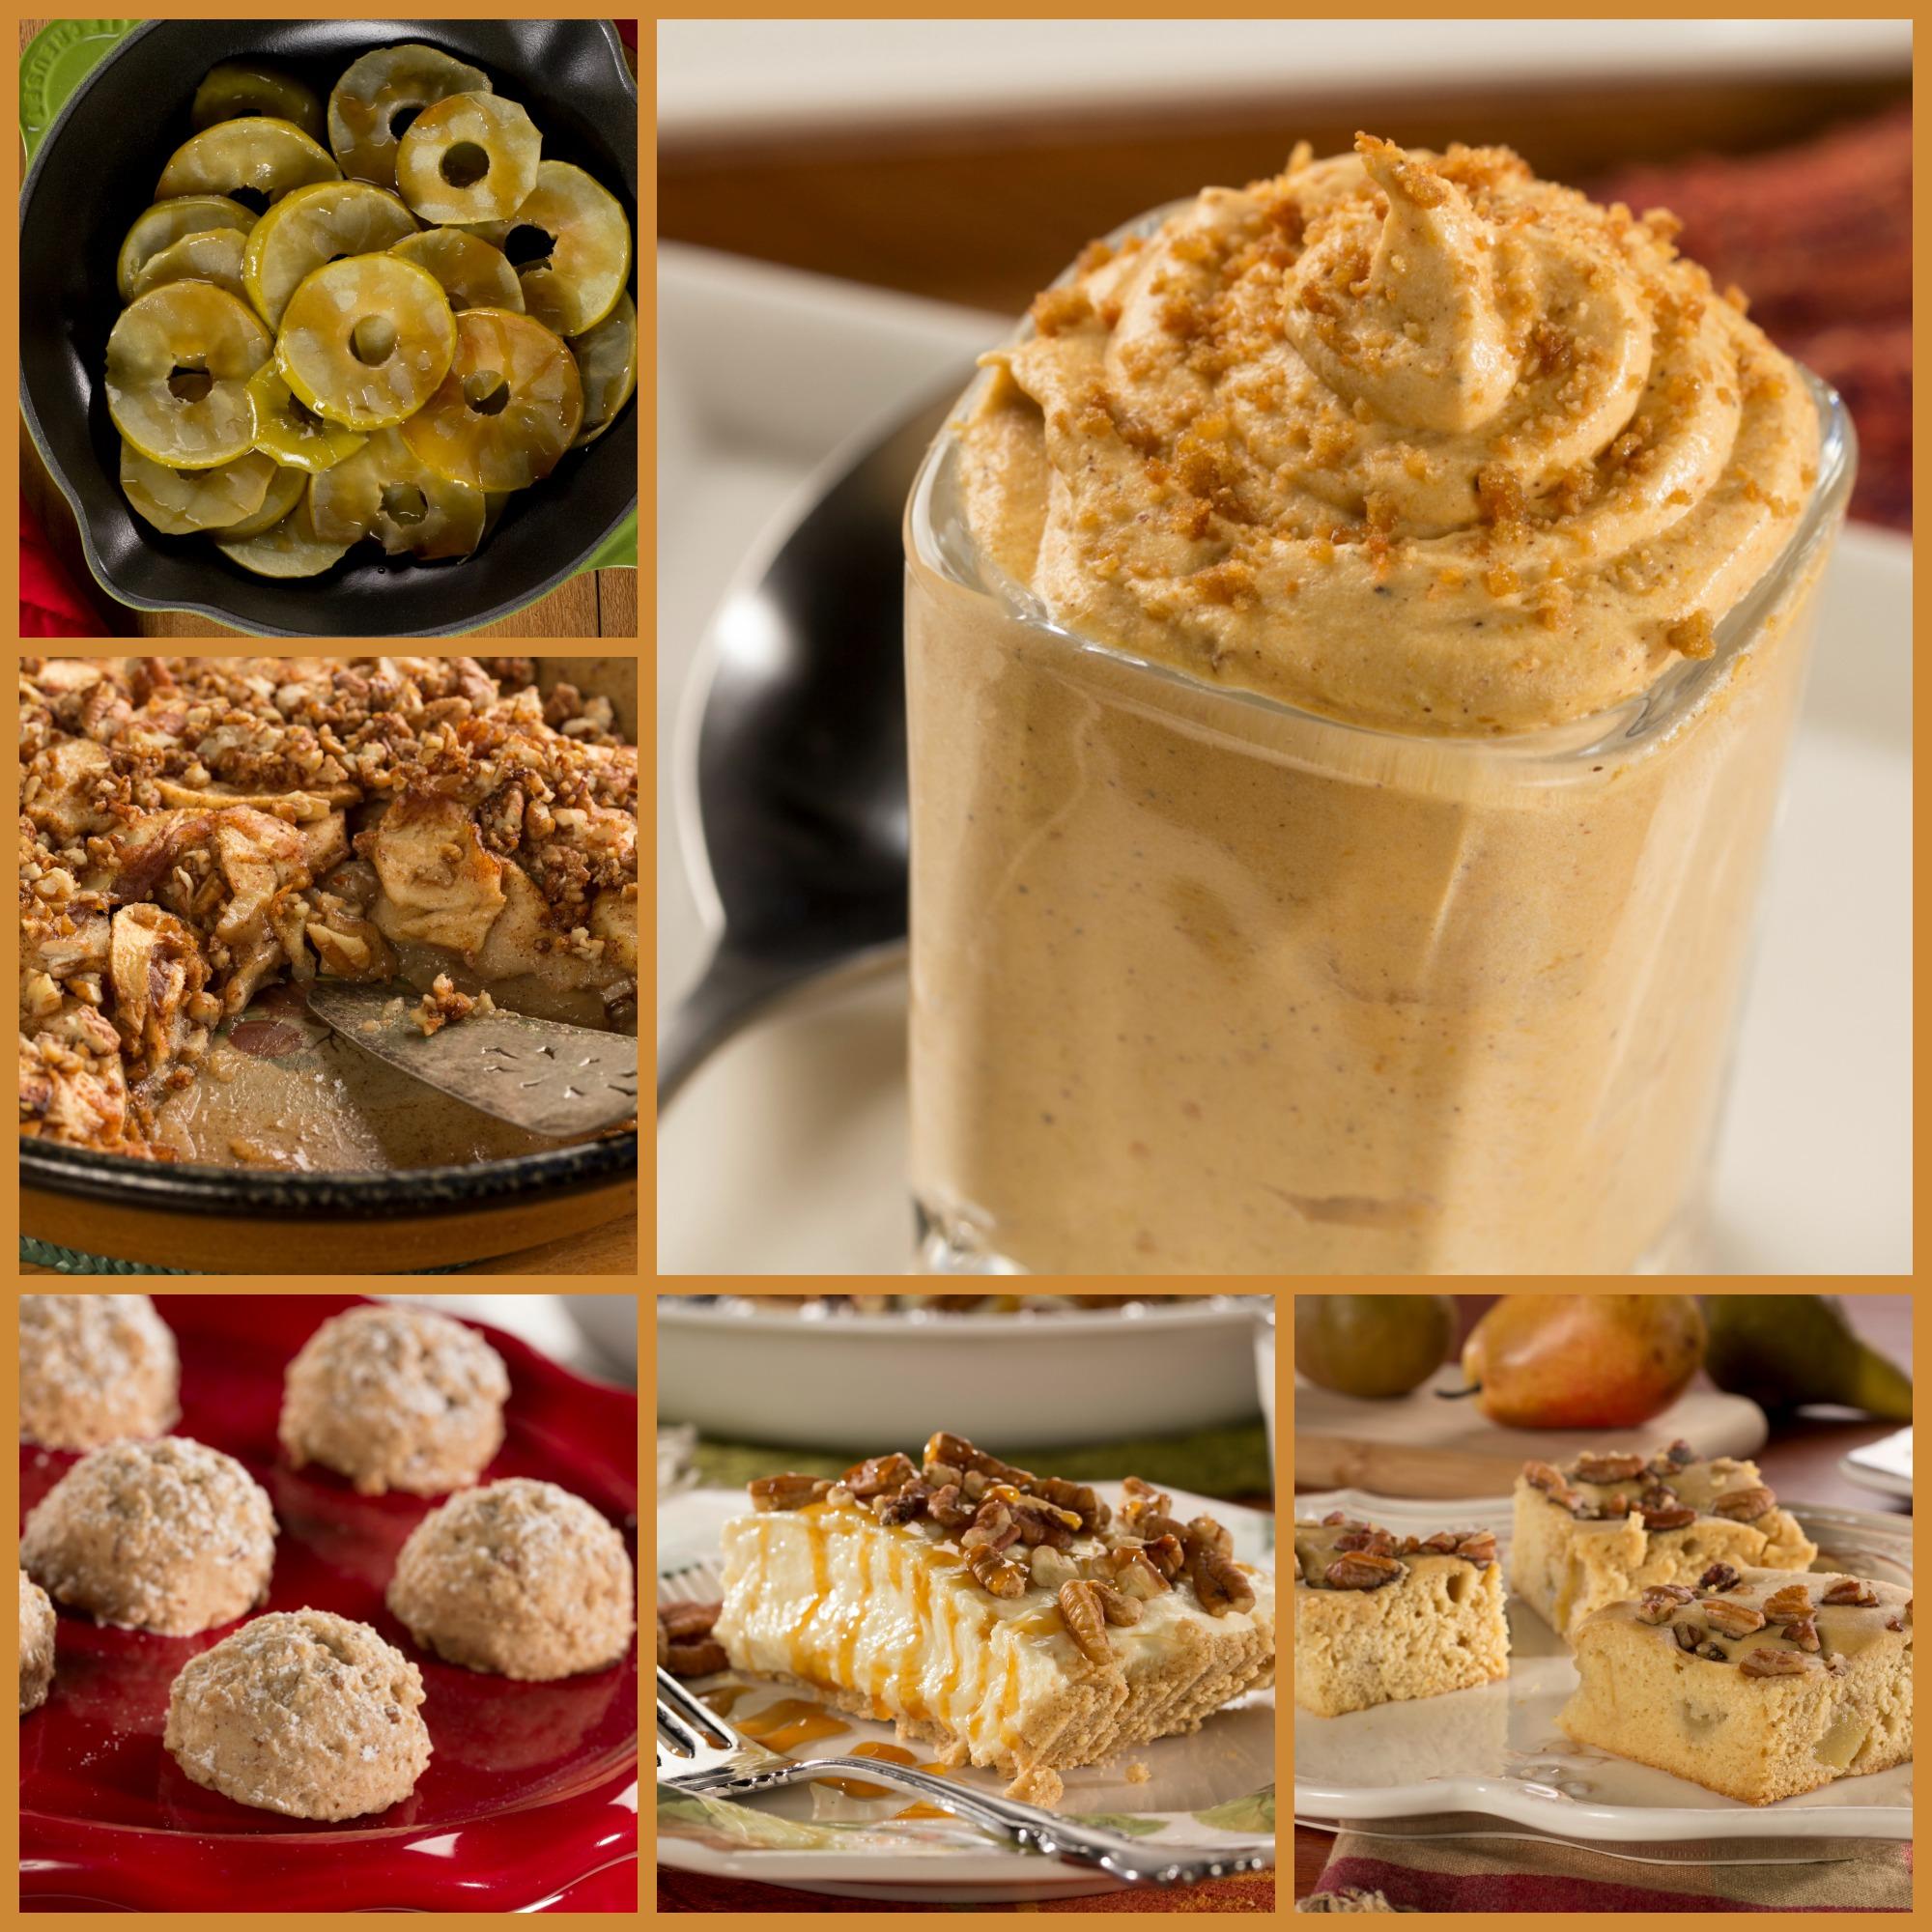 mf_blog_healthy-fall-recipes_desserts_10252016